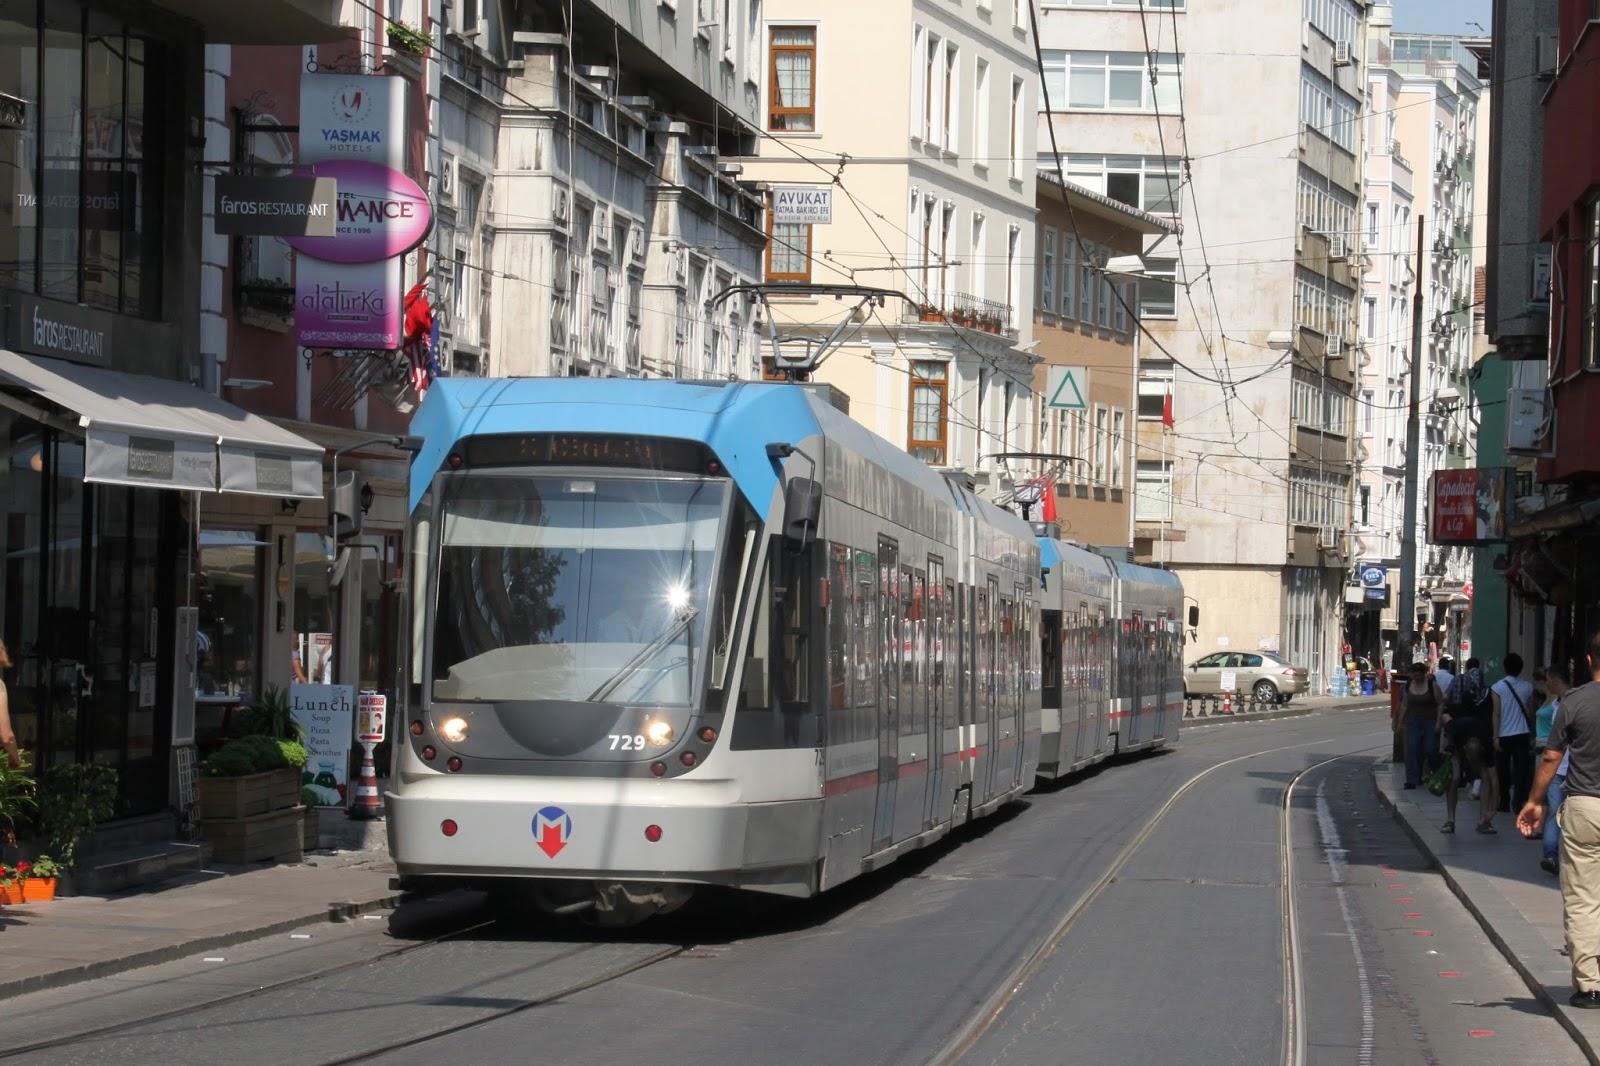 Transporte Publico en Estambul - Viajes a Turquia